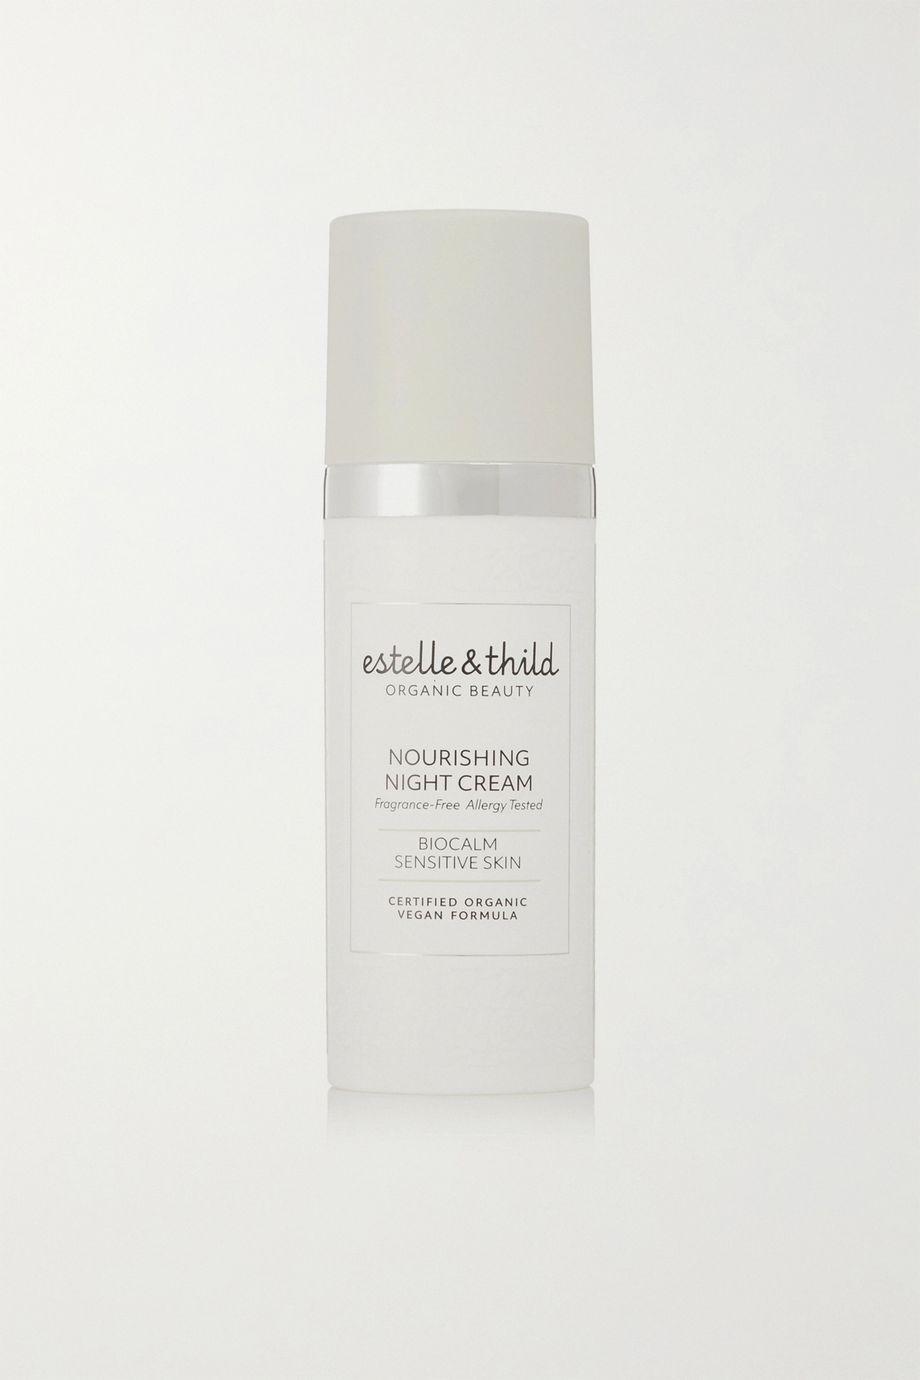 Estelle & Thild BioCalm Extra Nourishing Night Cream, 50ml